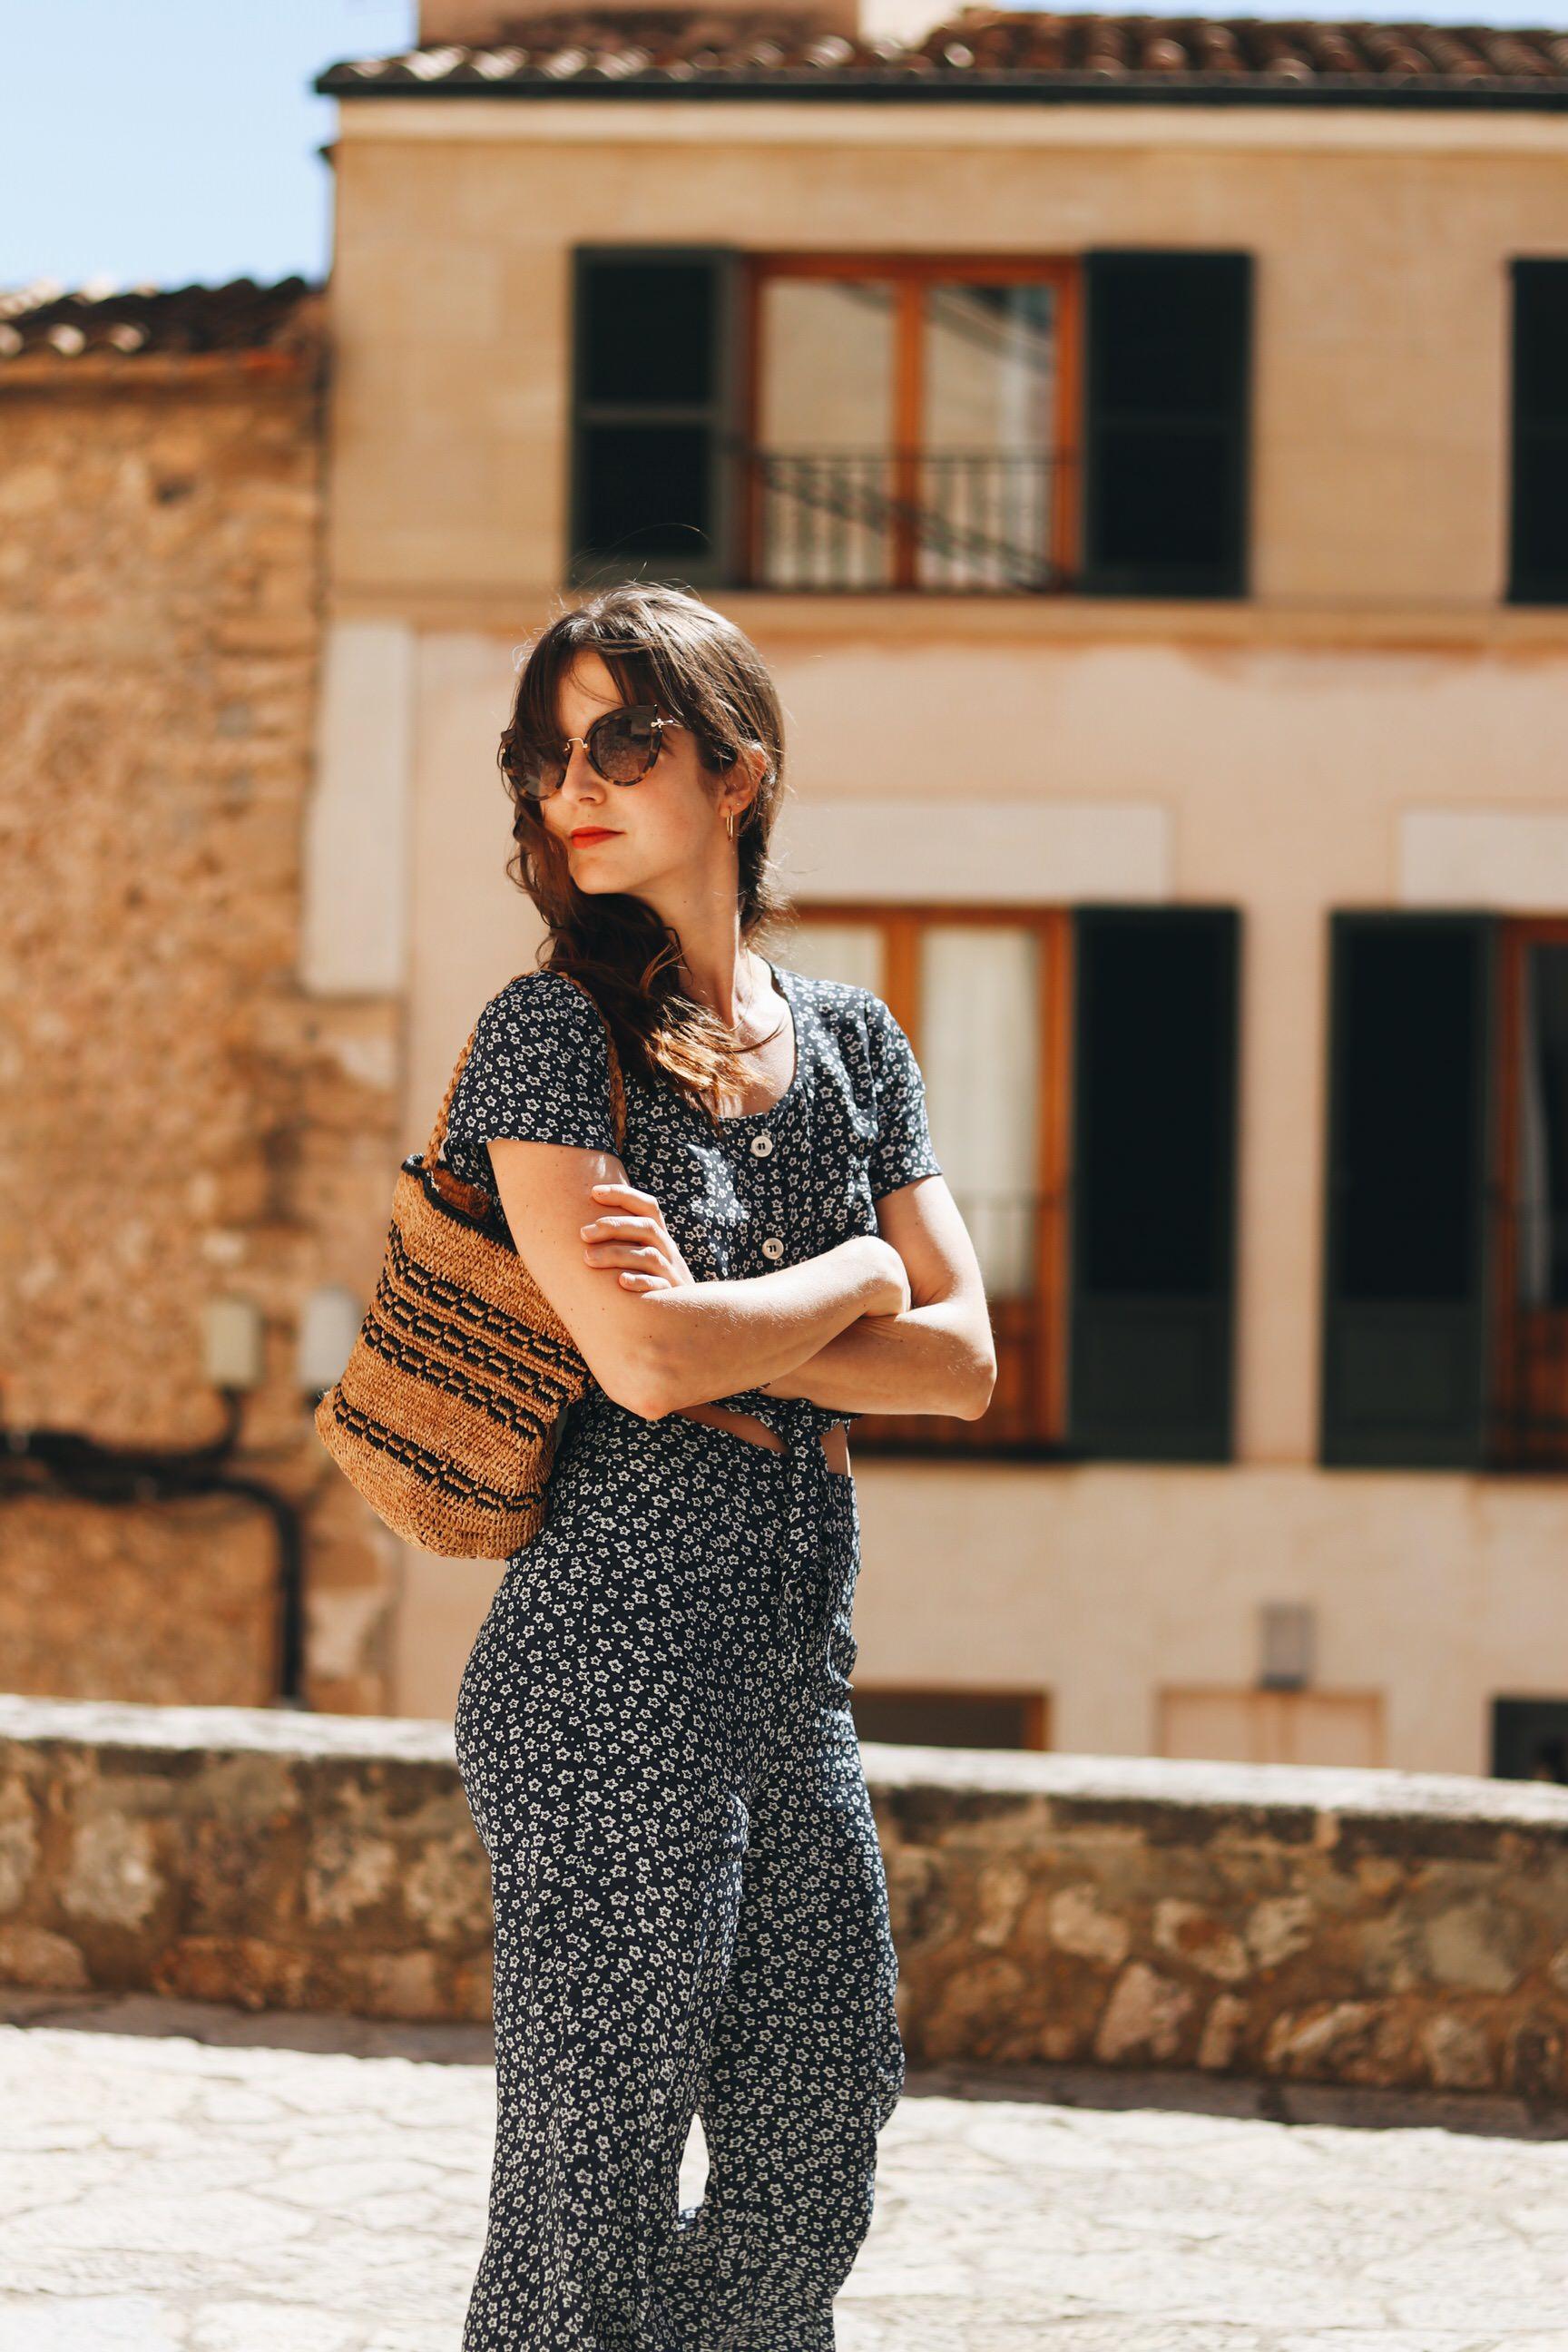 Blumenmuster Jumpsuit Zweiteiler Korbtasche Miu Miu Sonnenbrille Blog Outfit Mallorca